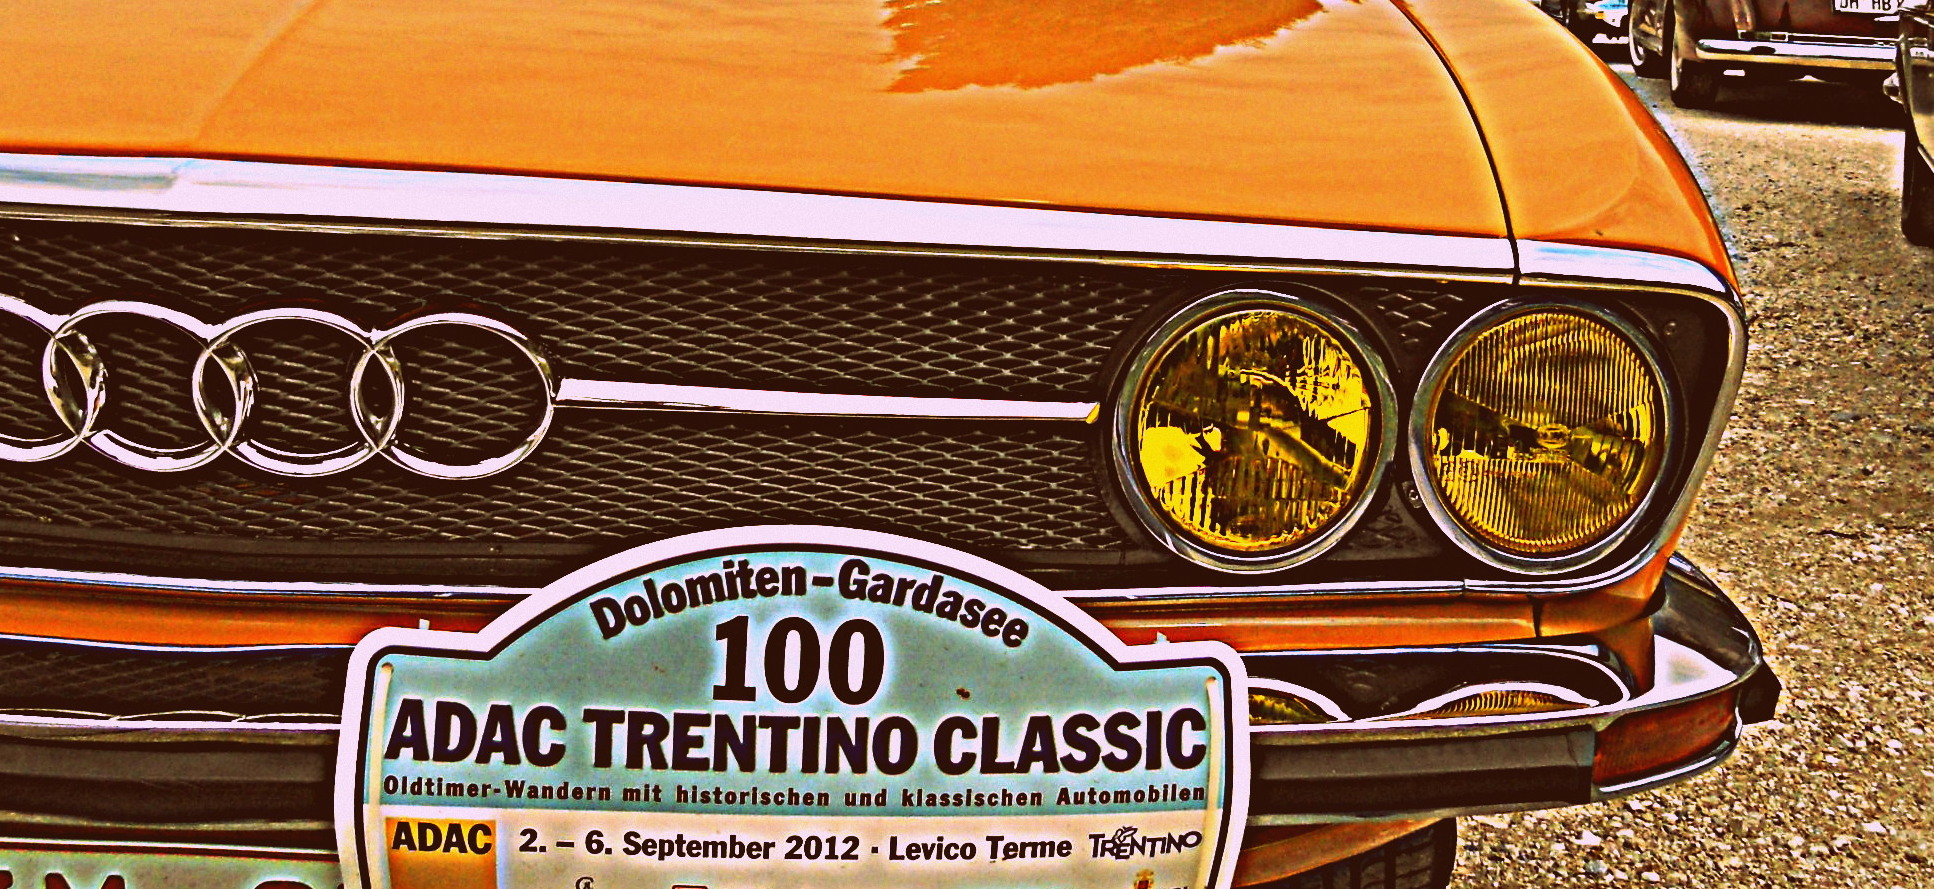 Tuningsuche.de – Bericht zur ADAC Trentino Classic 2012